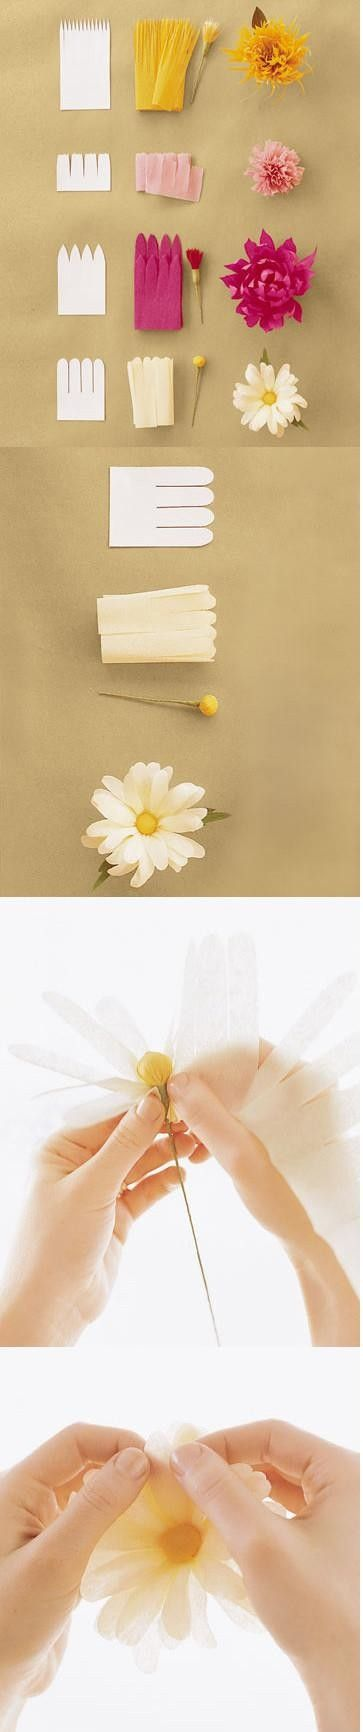 Child [Ali] ~ love of learning 团丸 简单 ~ flowers Komori system